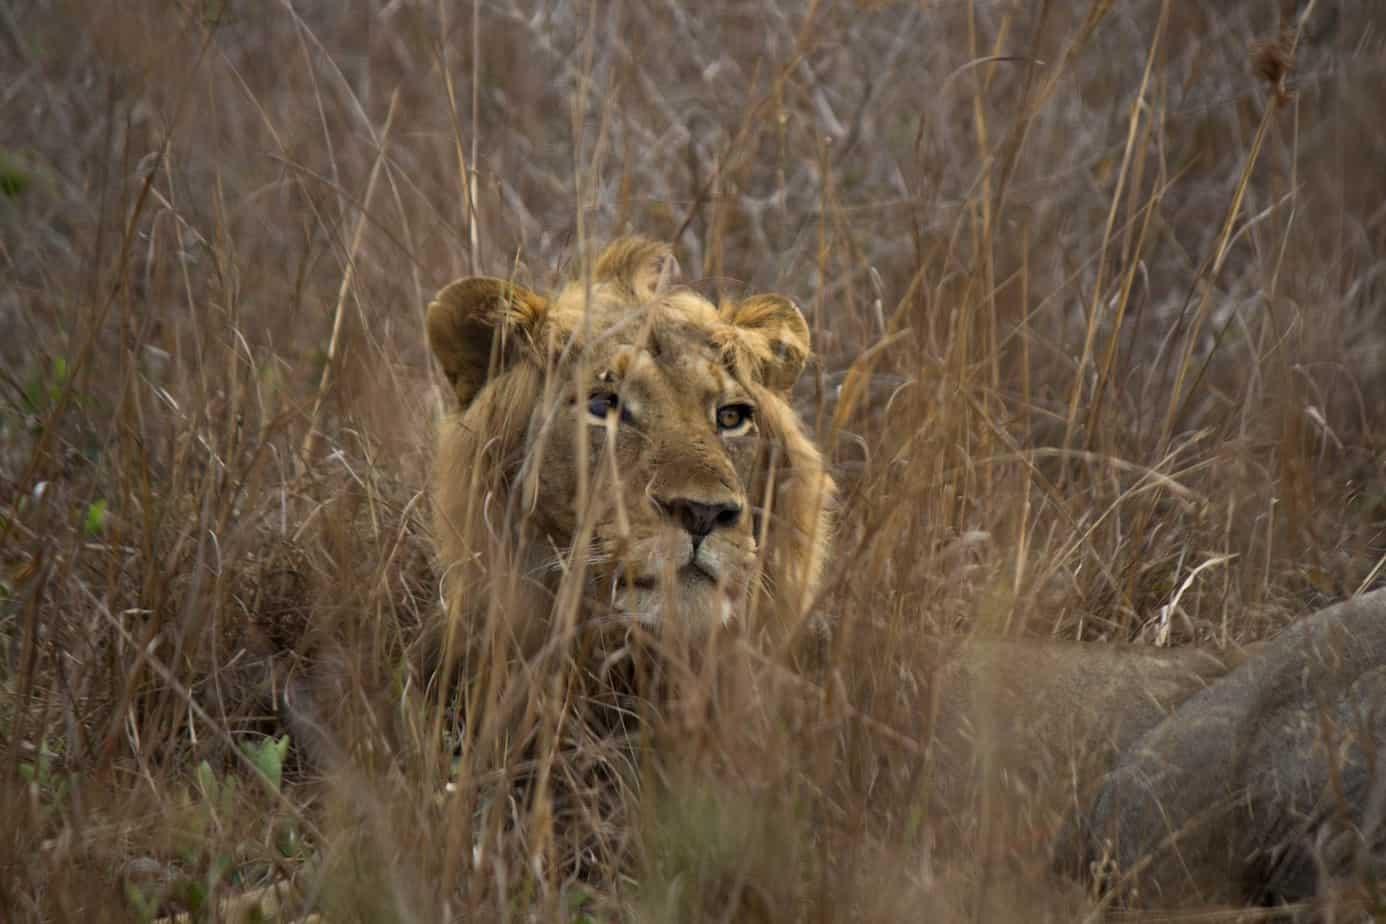 Lion @ Tembe Elephant Park. Photo: Håvard Rosenlund